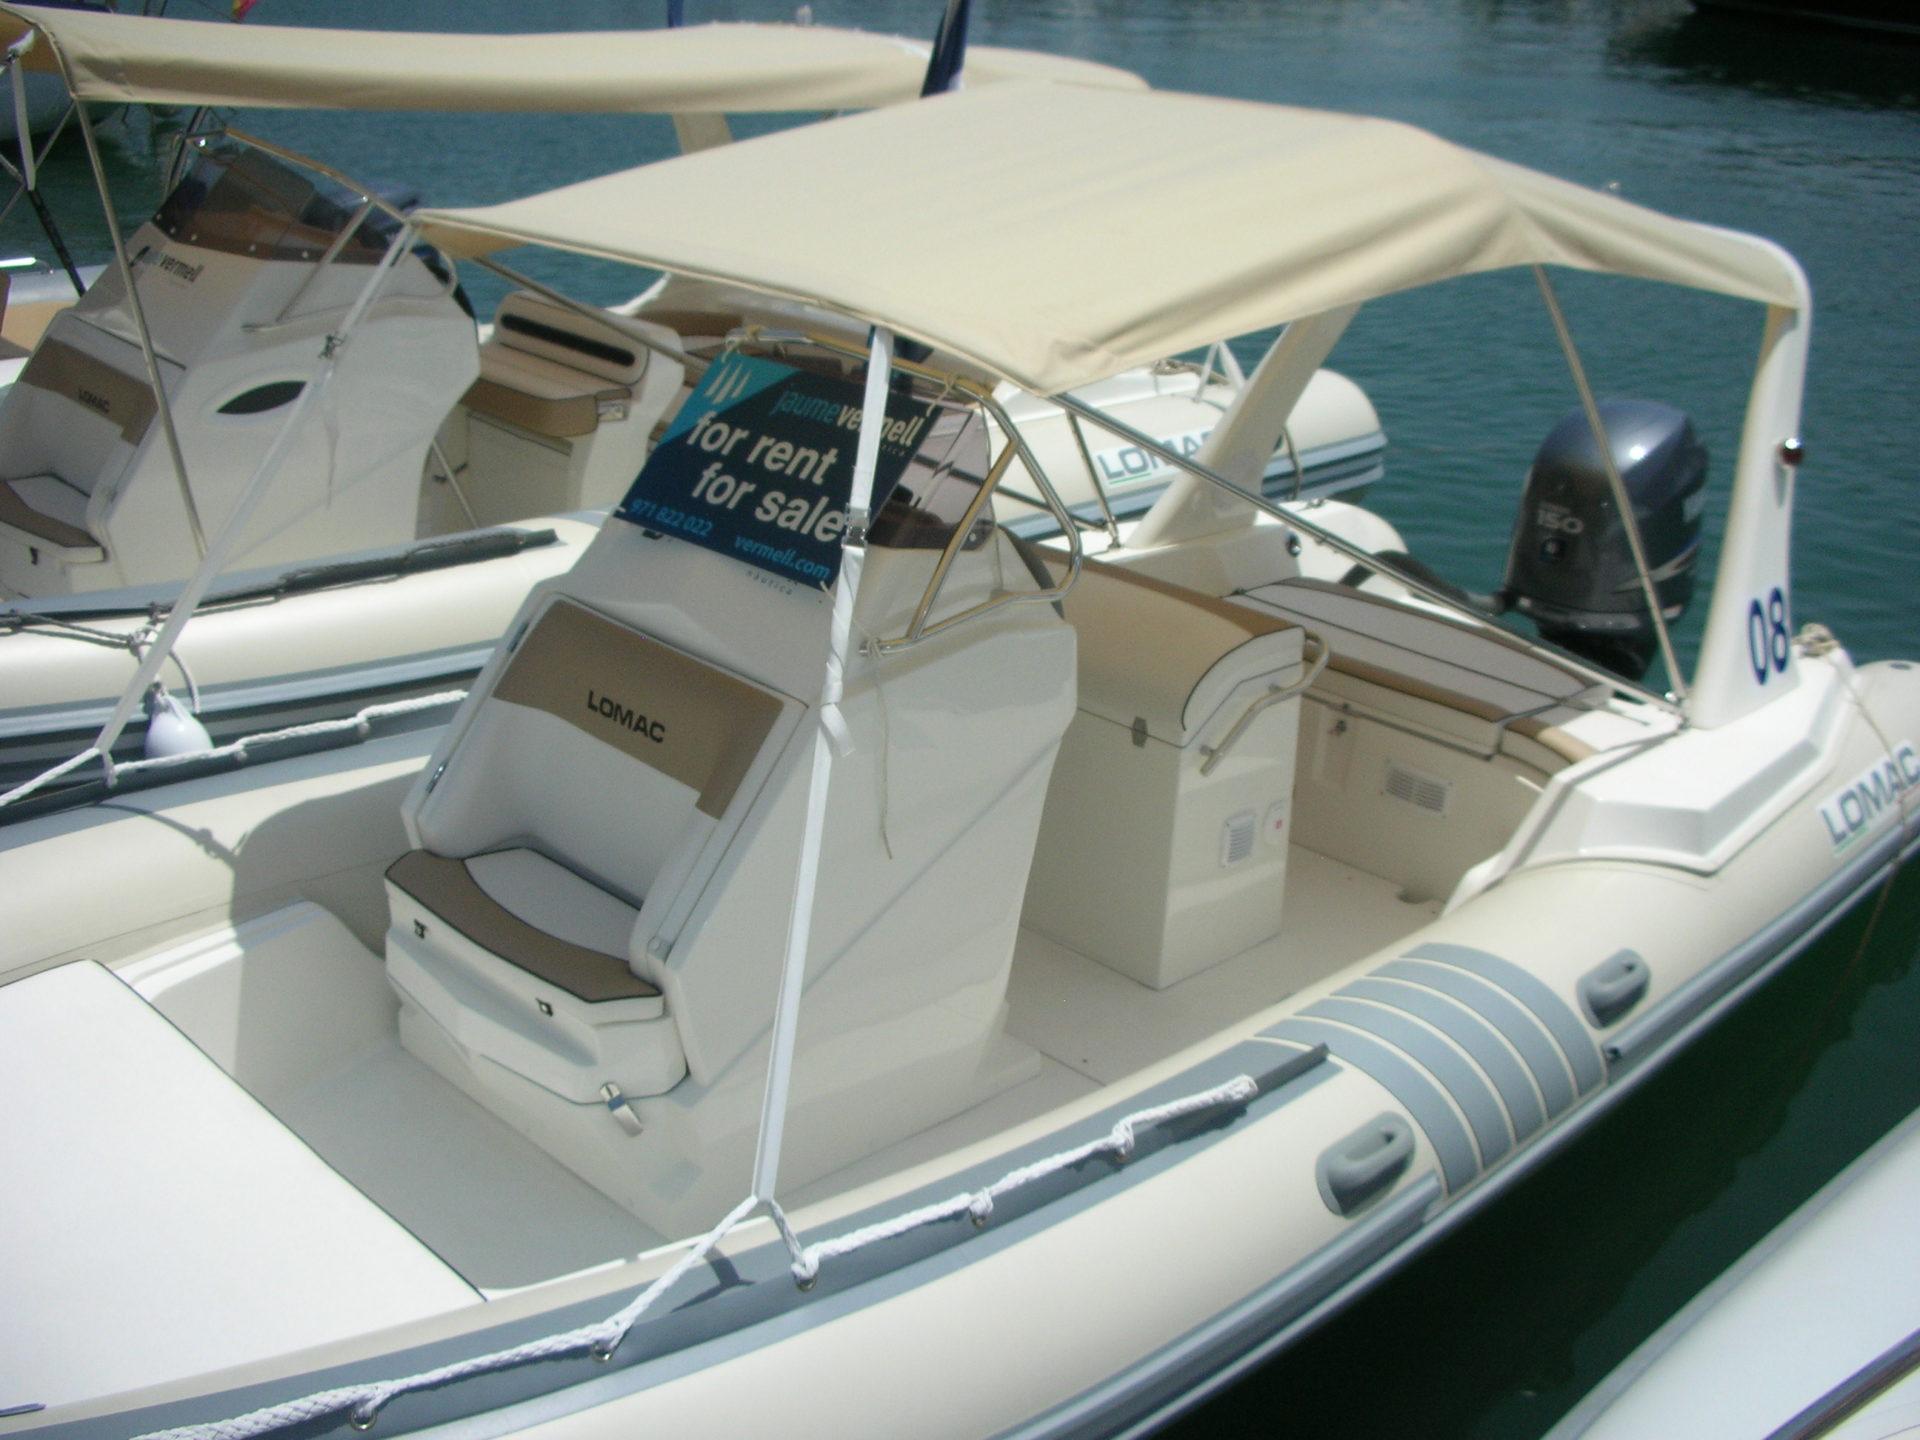 schlauchboot-lomac-710 1